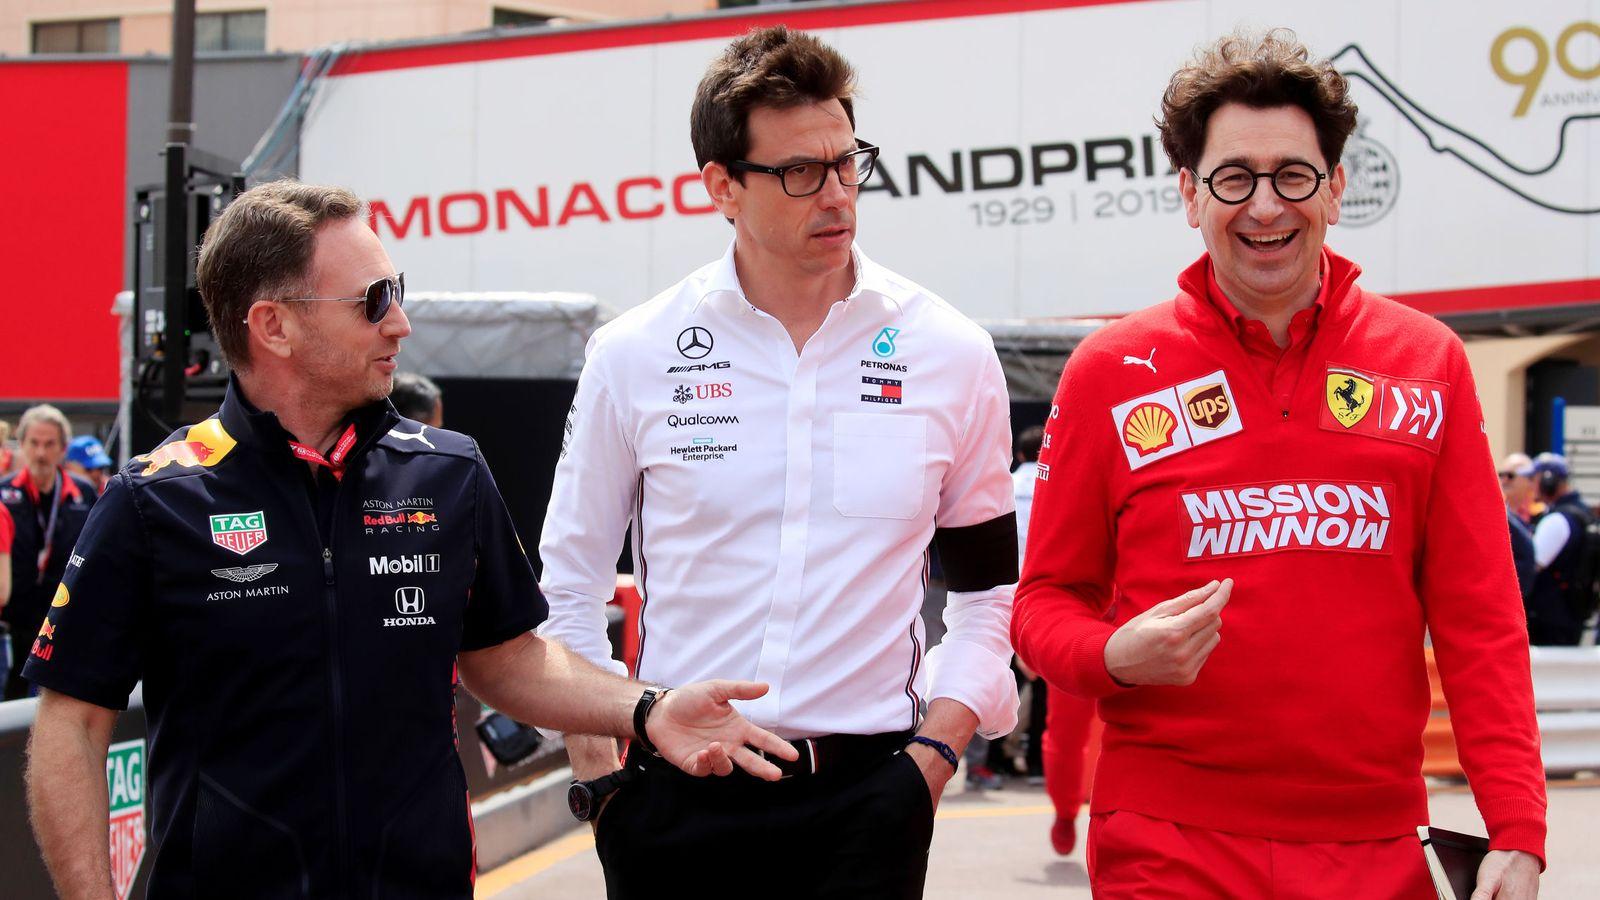 Foto: El baile de pilotos puede tocar a los tres grandes de la Fórmula 1. (Reuters))